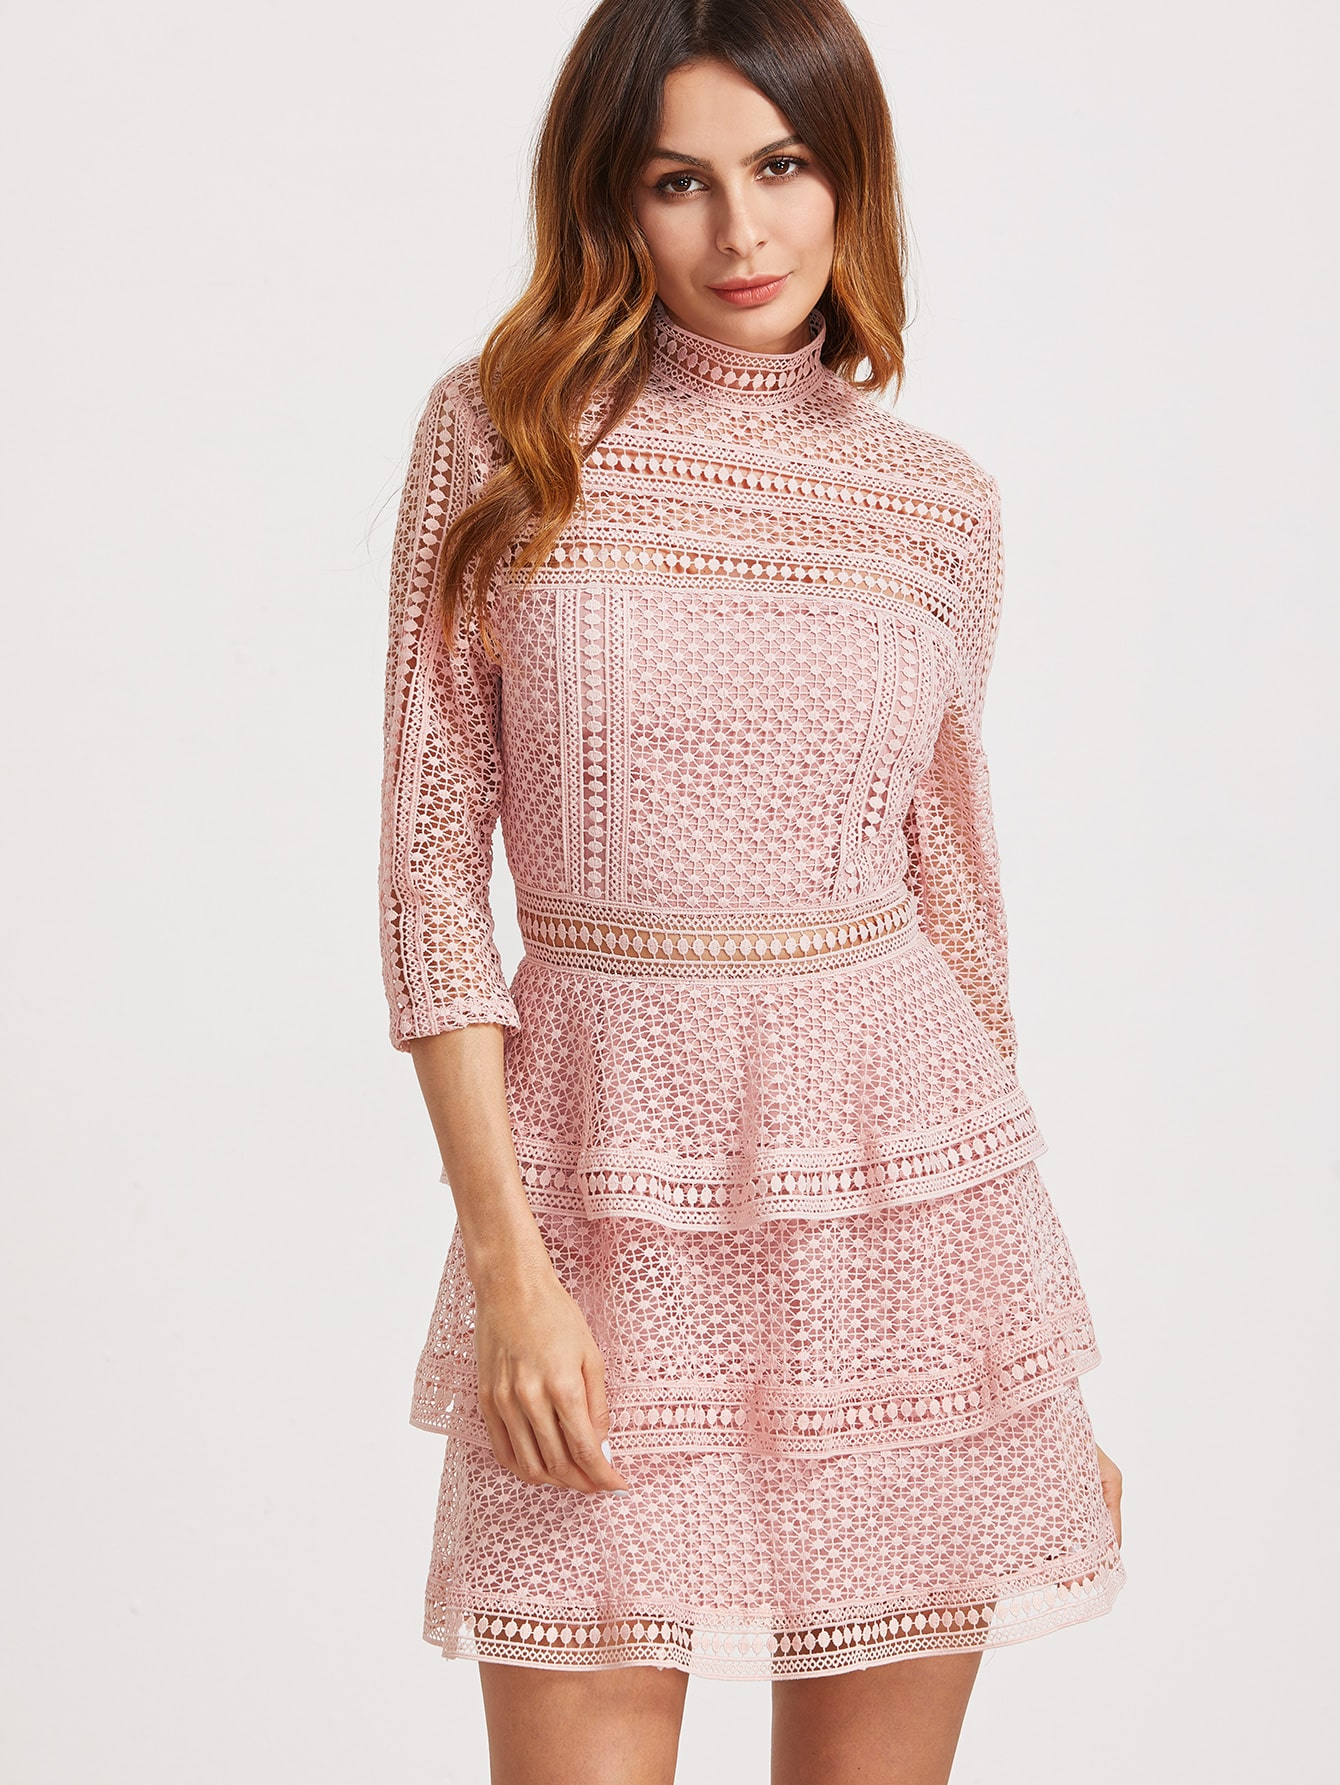 Pink High Neck 34 Sleeve Layered Dotted Crochet Dress Emmacloth